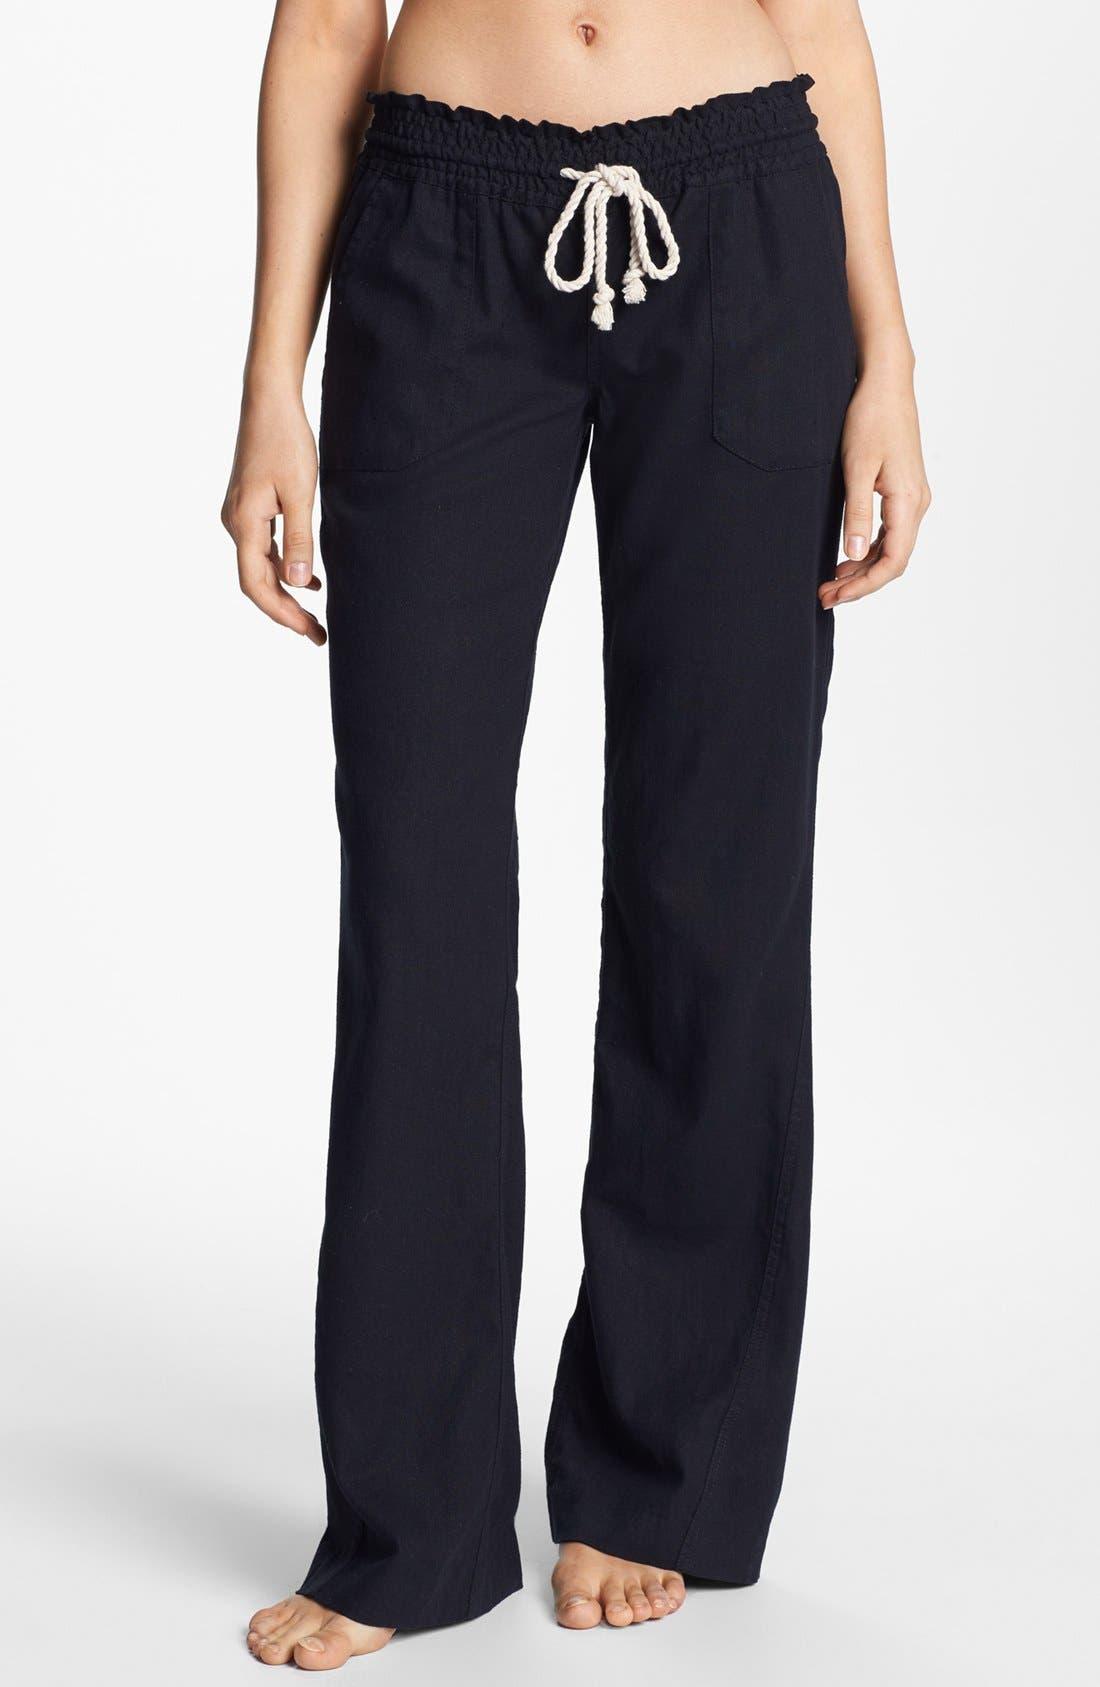 Roxy women/'s small Oceanside beach pants in living coral linen blend